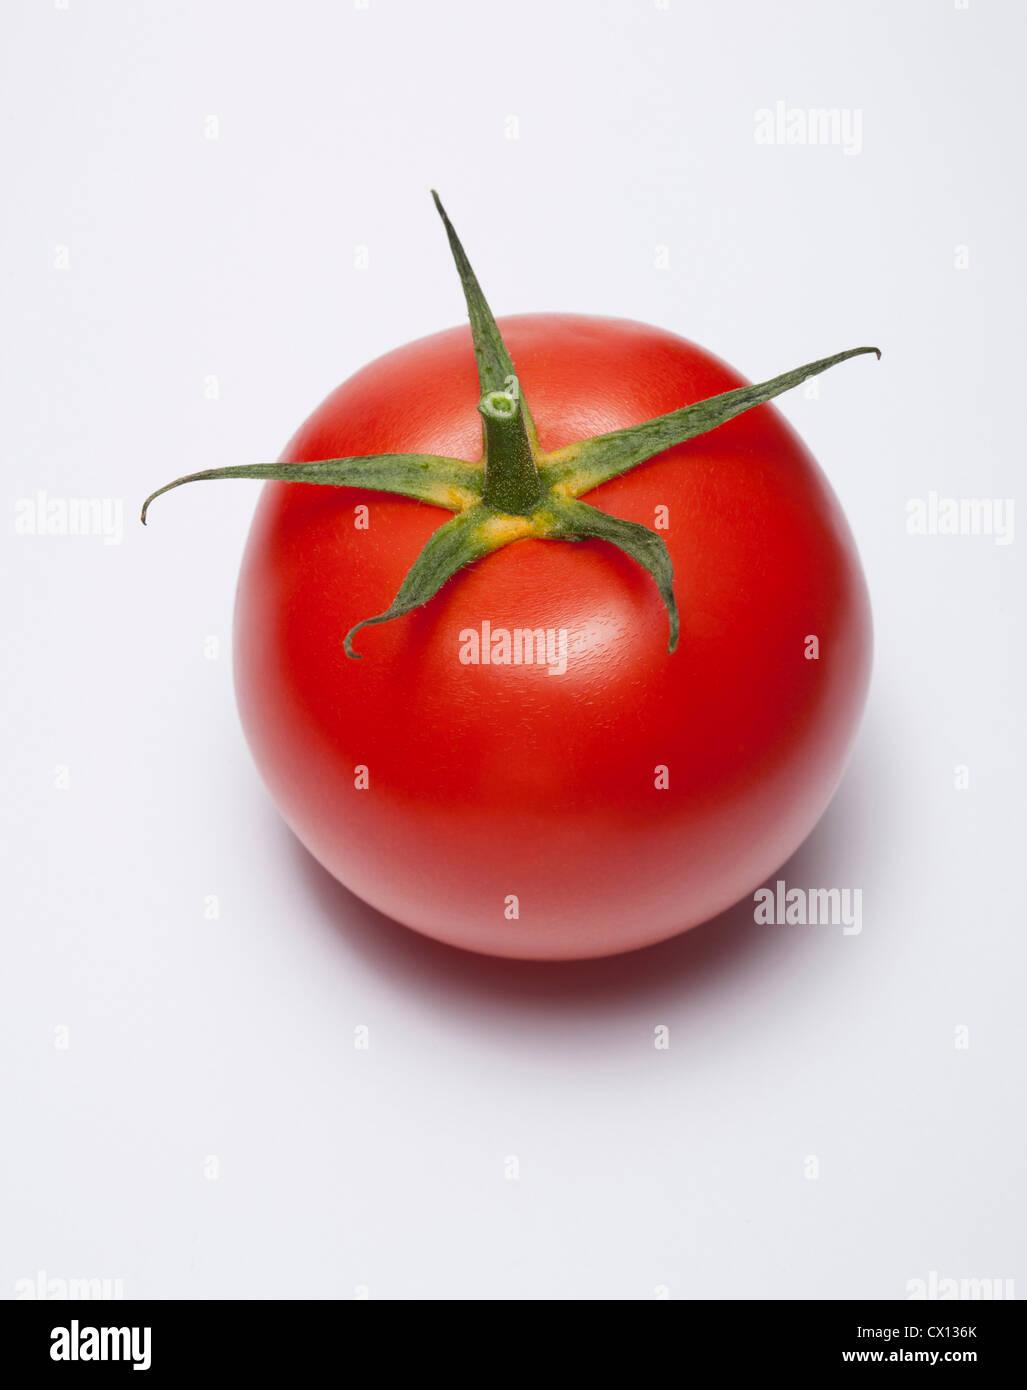 Red tomato - Stock Image